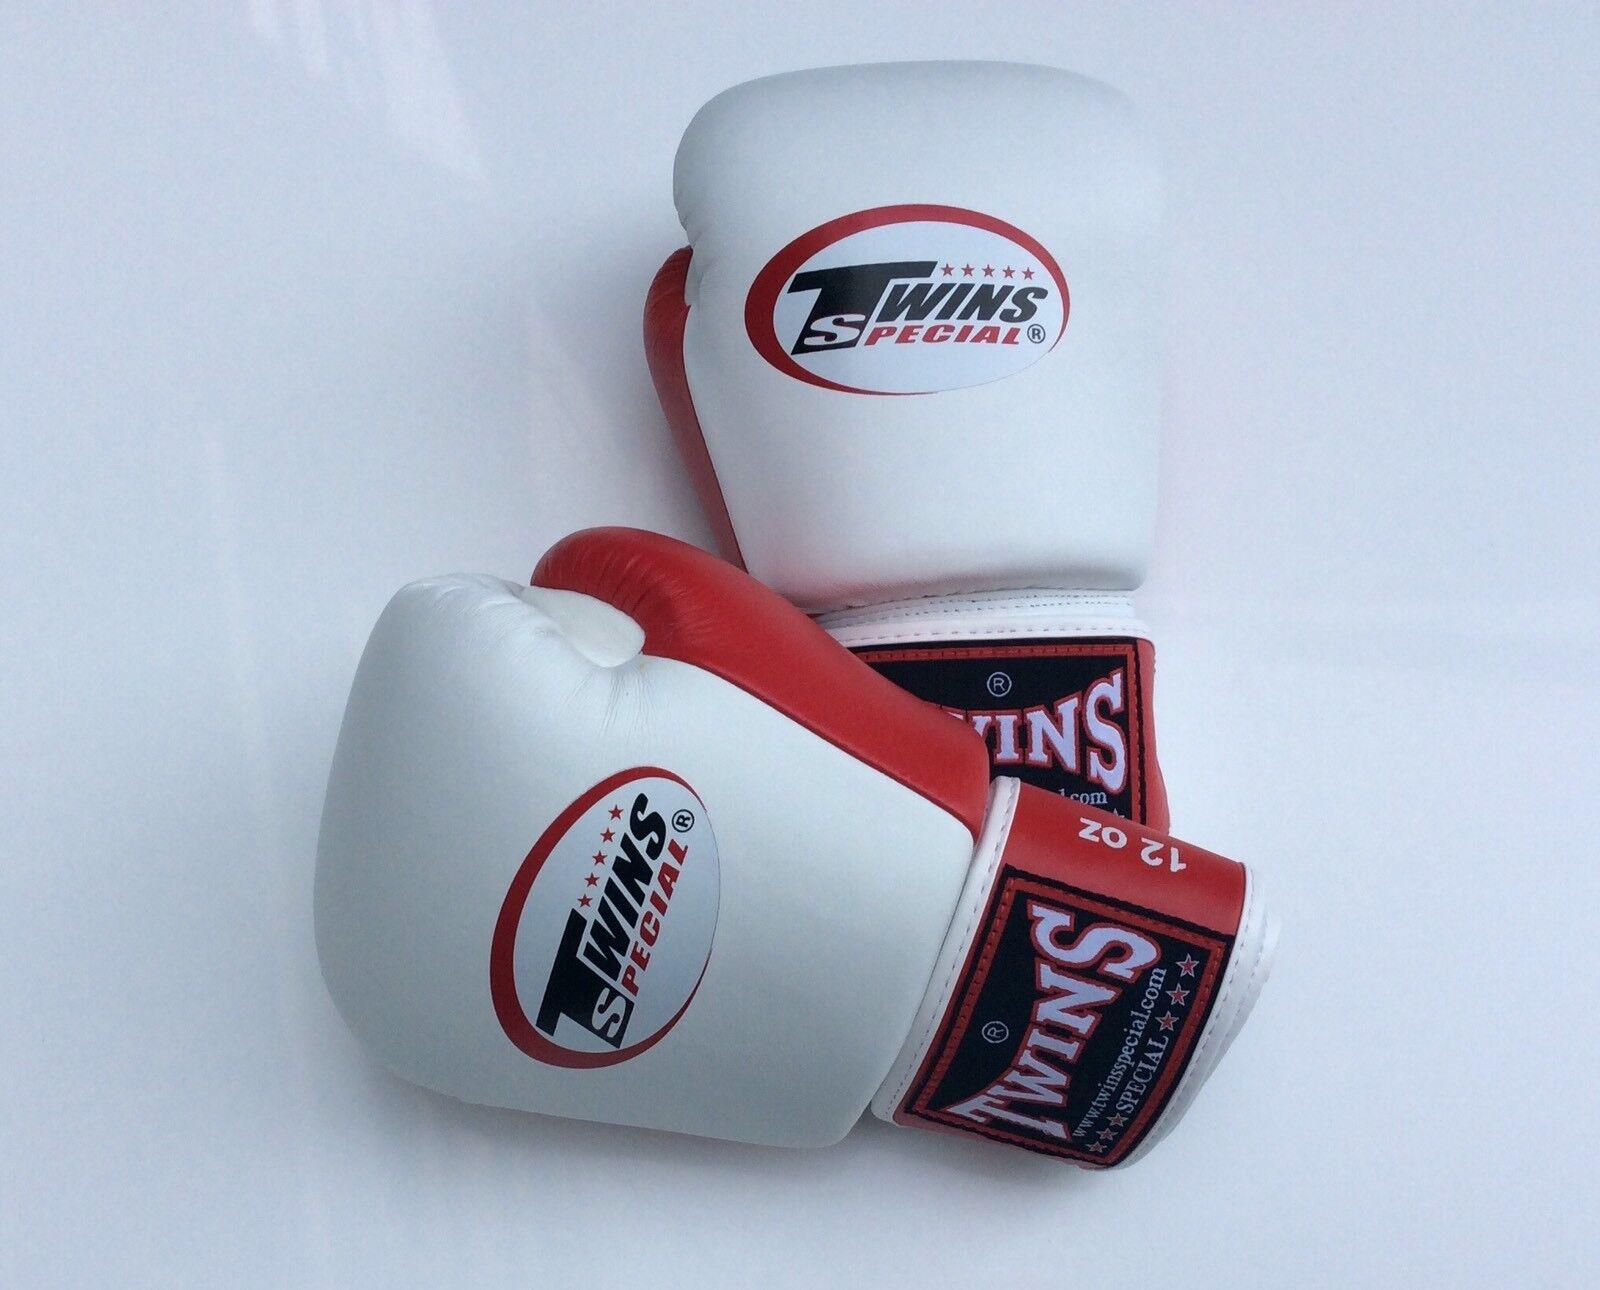 Twins Special Bgvl-3T Weiß/ROT 10oz Muay Thai/ Boxing Gloves